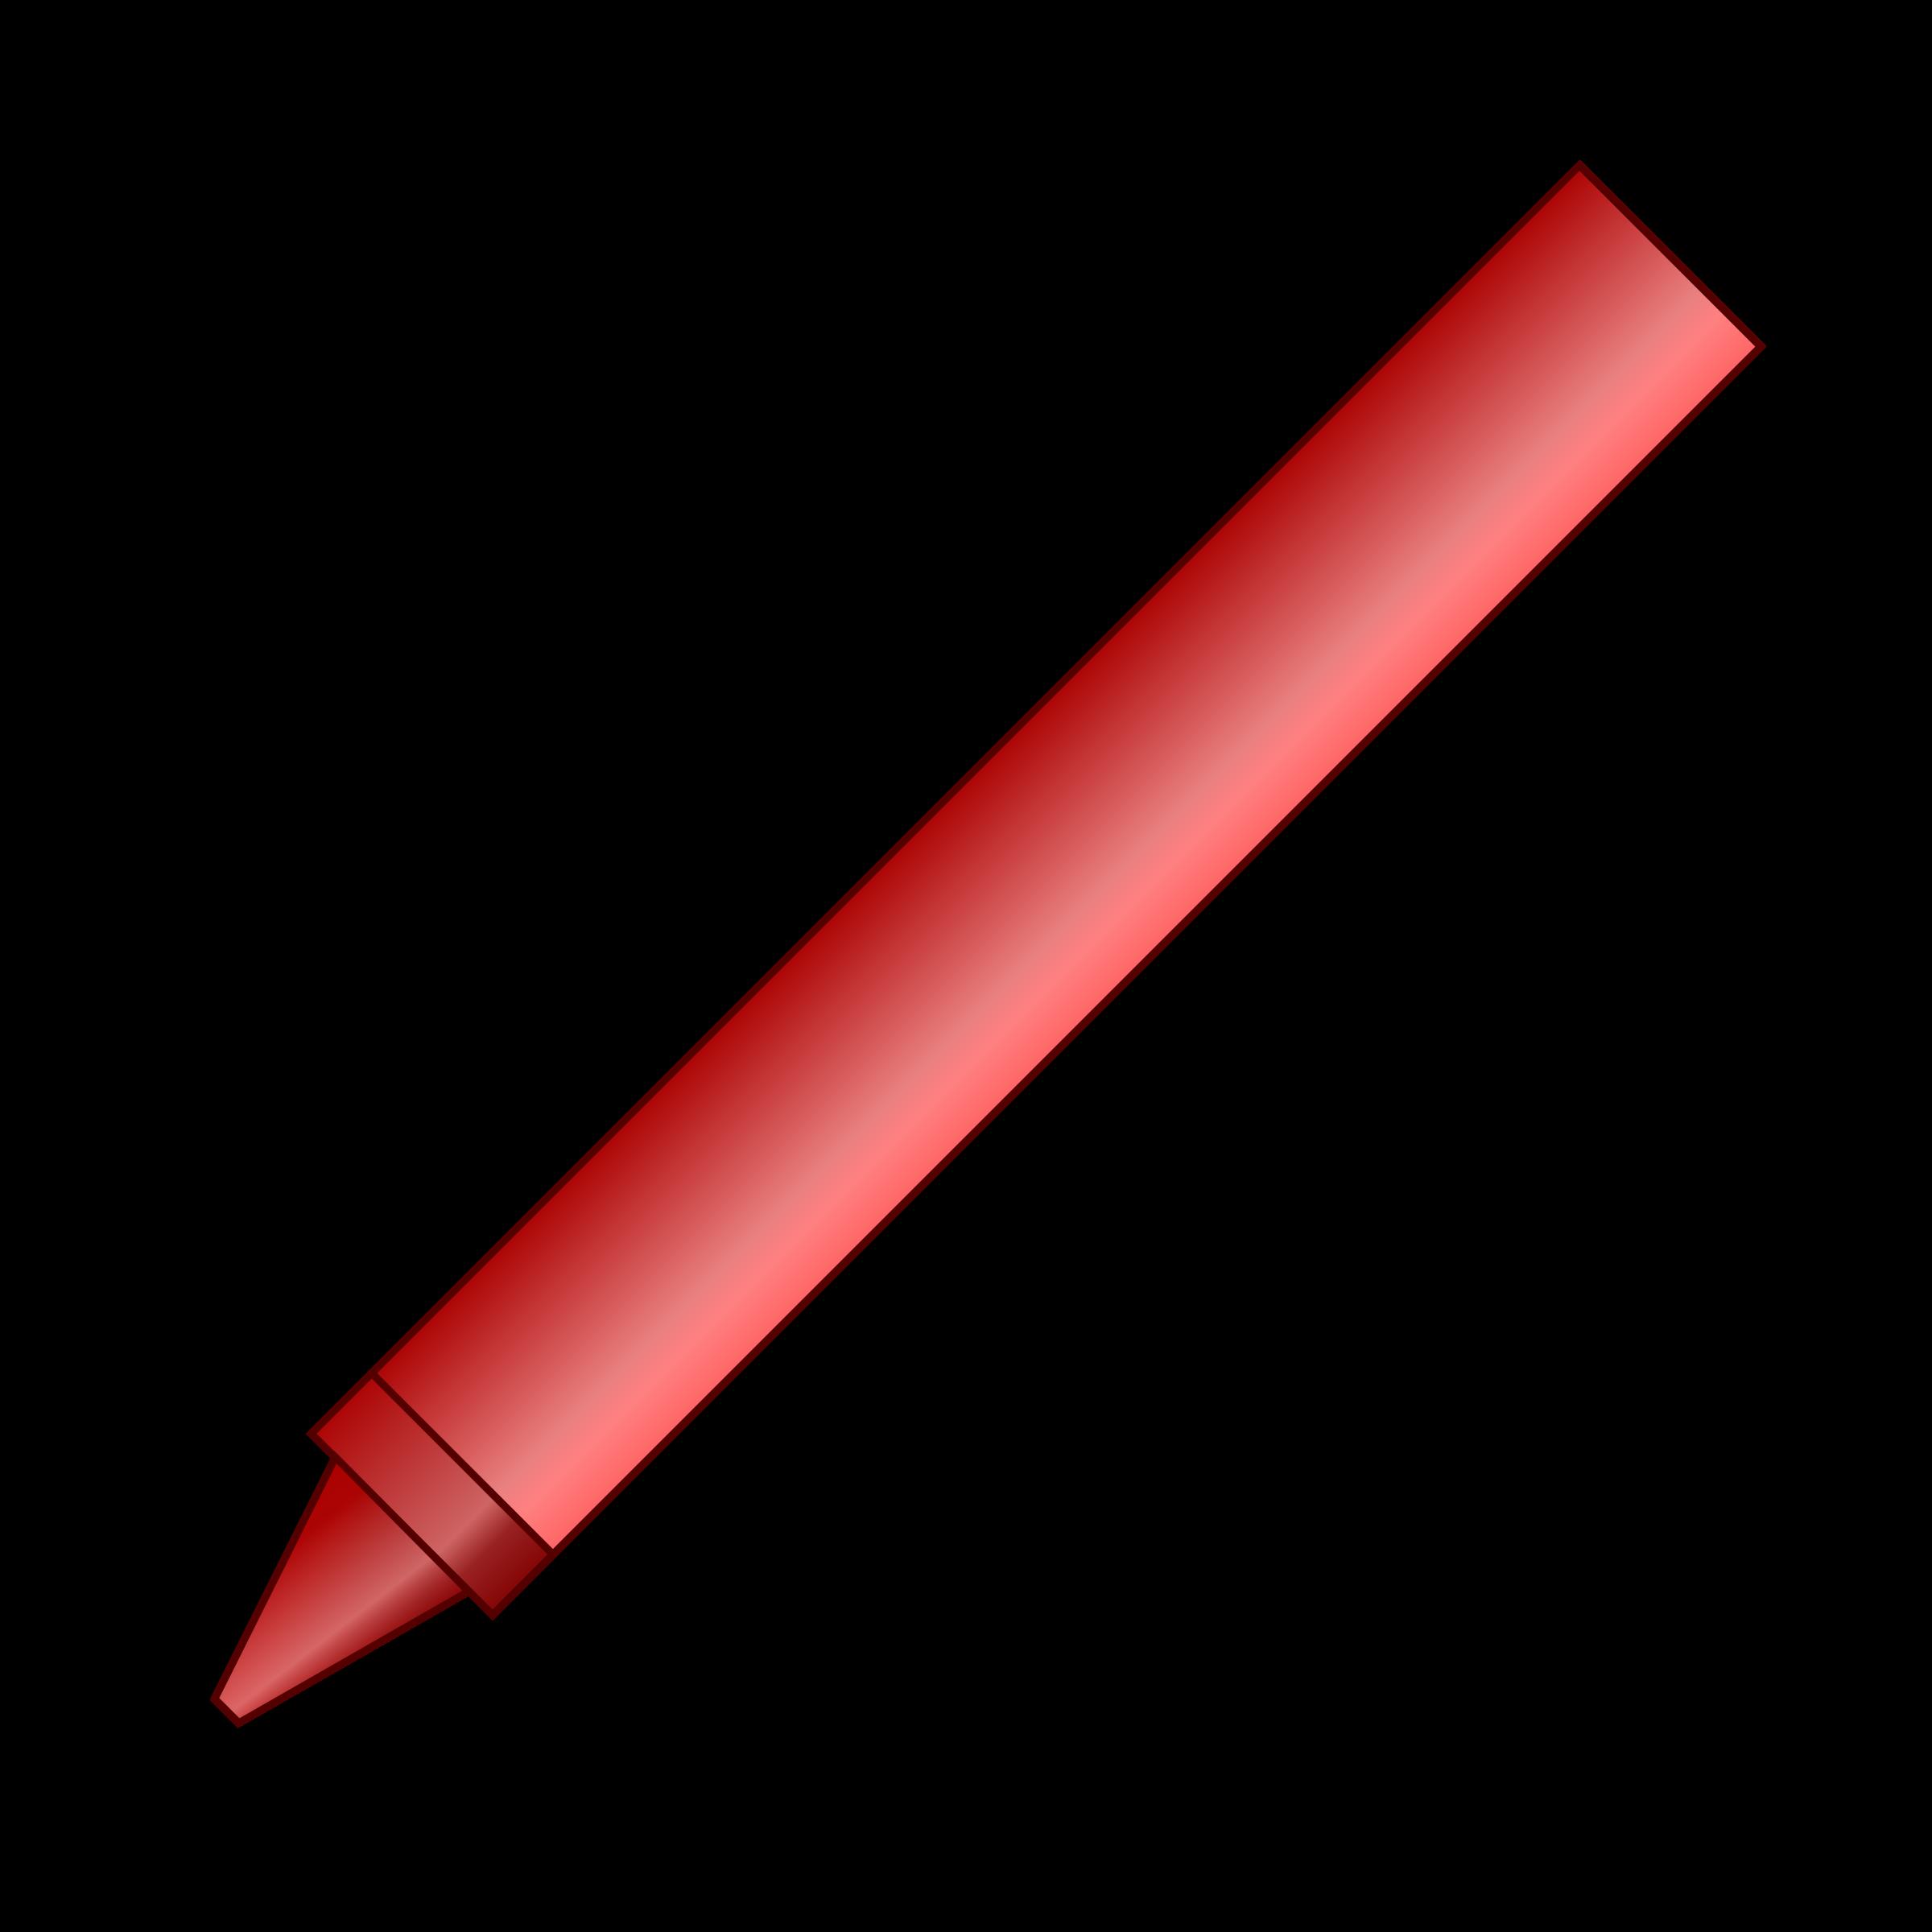 Clipart writing crayon. Big image png